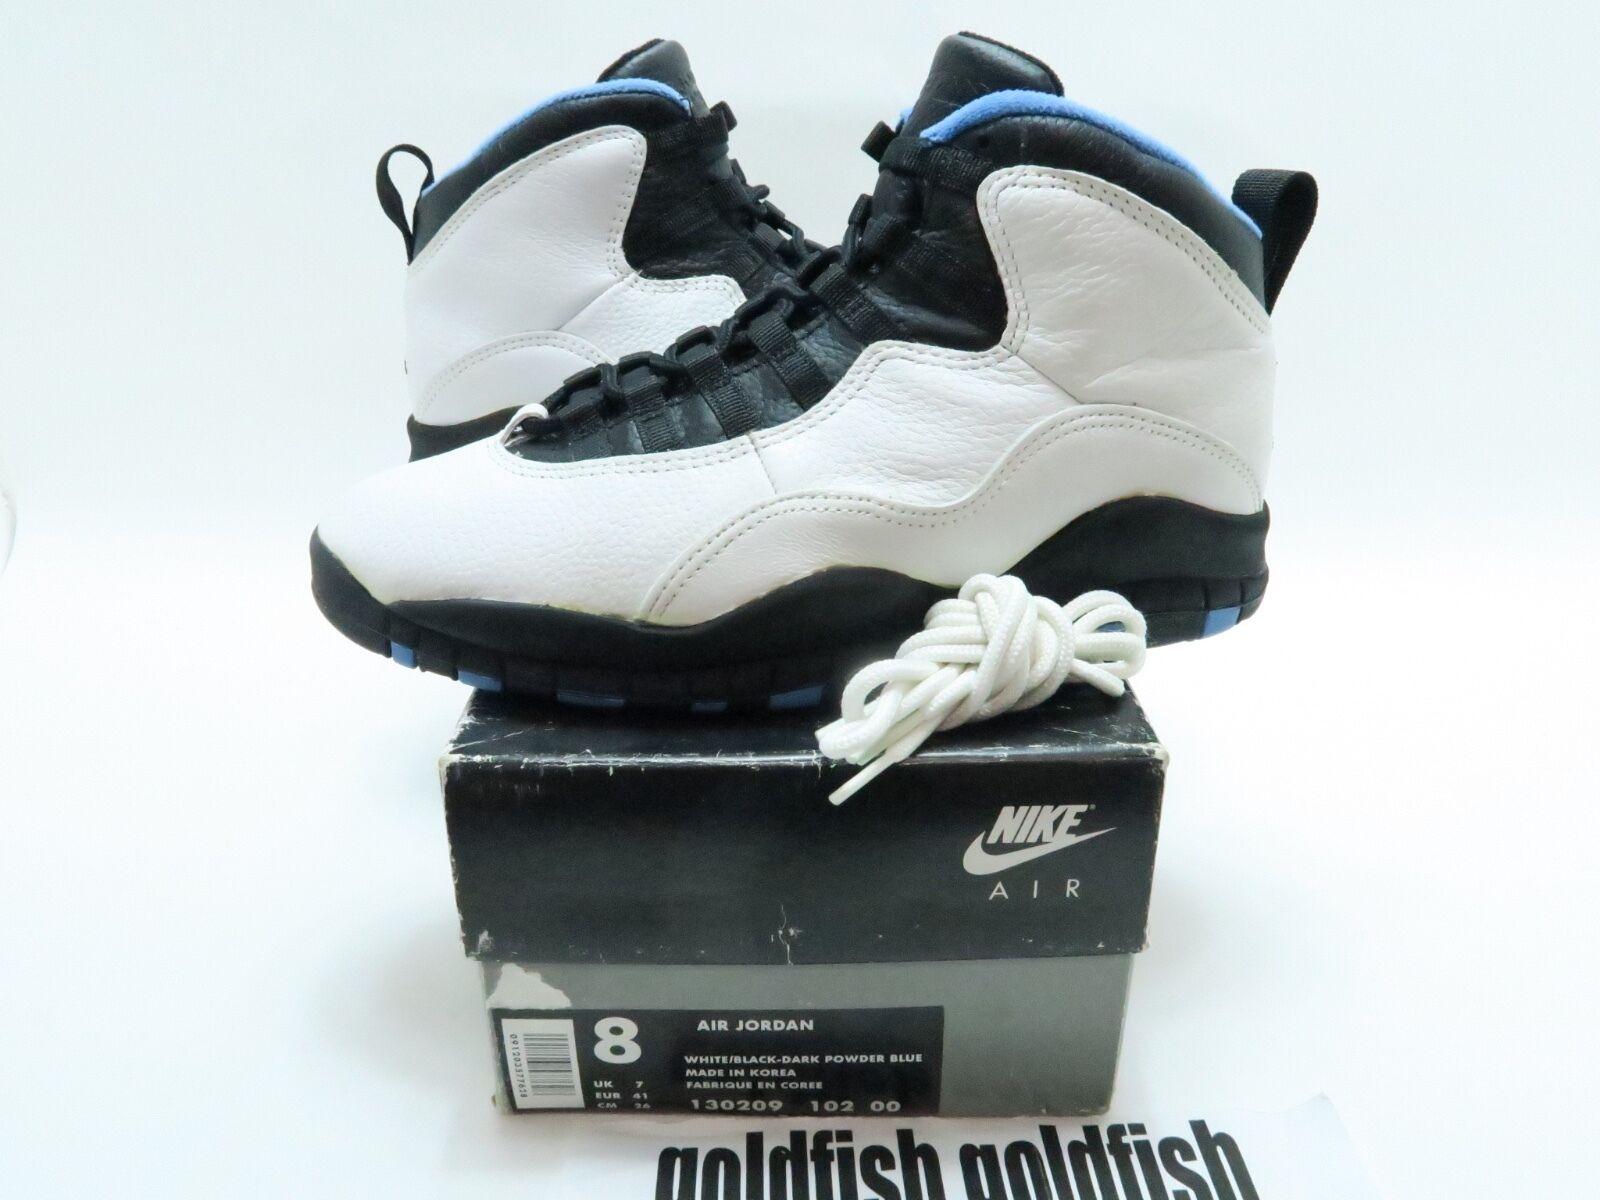 VNDS Nike Air Jordan Retro 4 IV Columbia 8 Legend Blue Size 8 Columbia 314254-107 OG ALL bd9cce